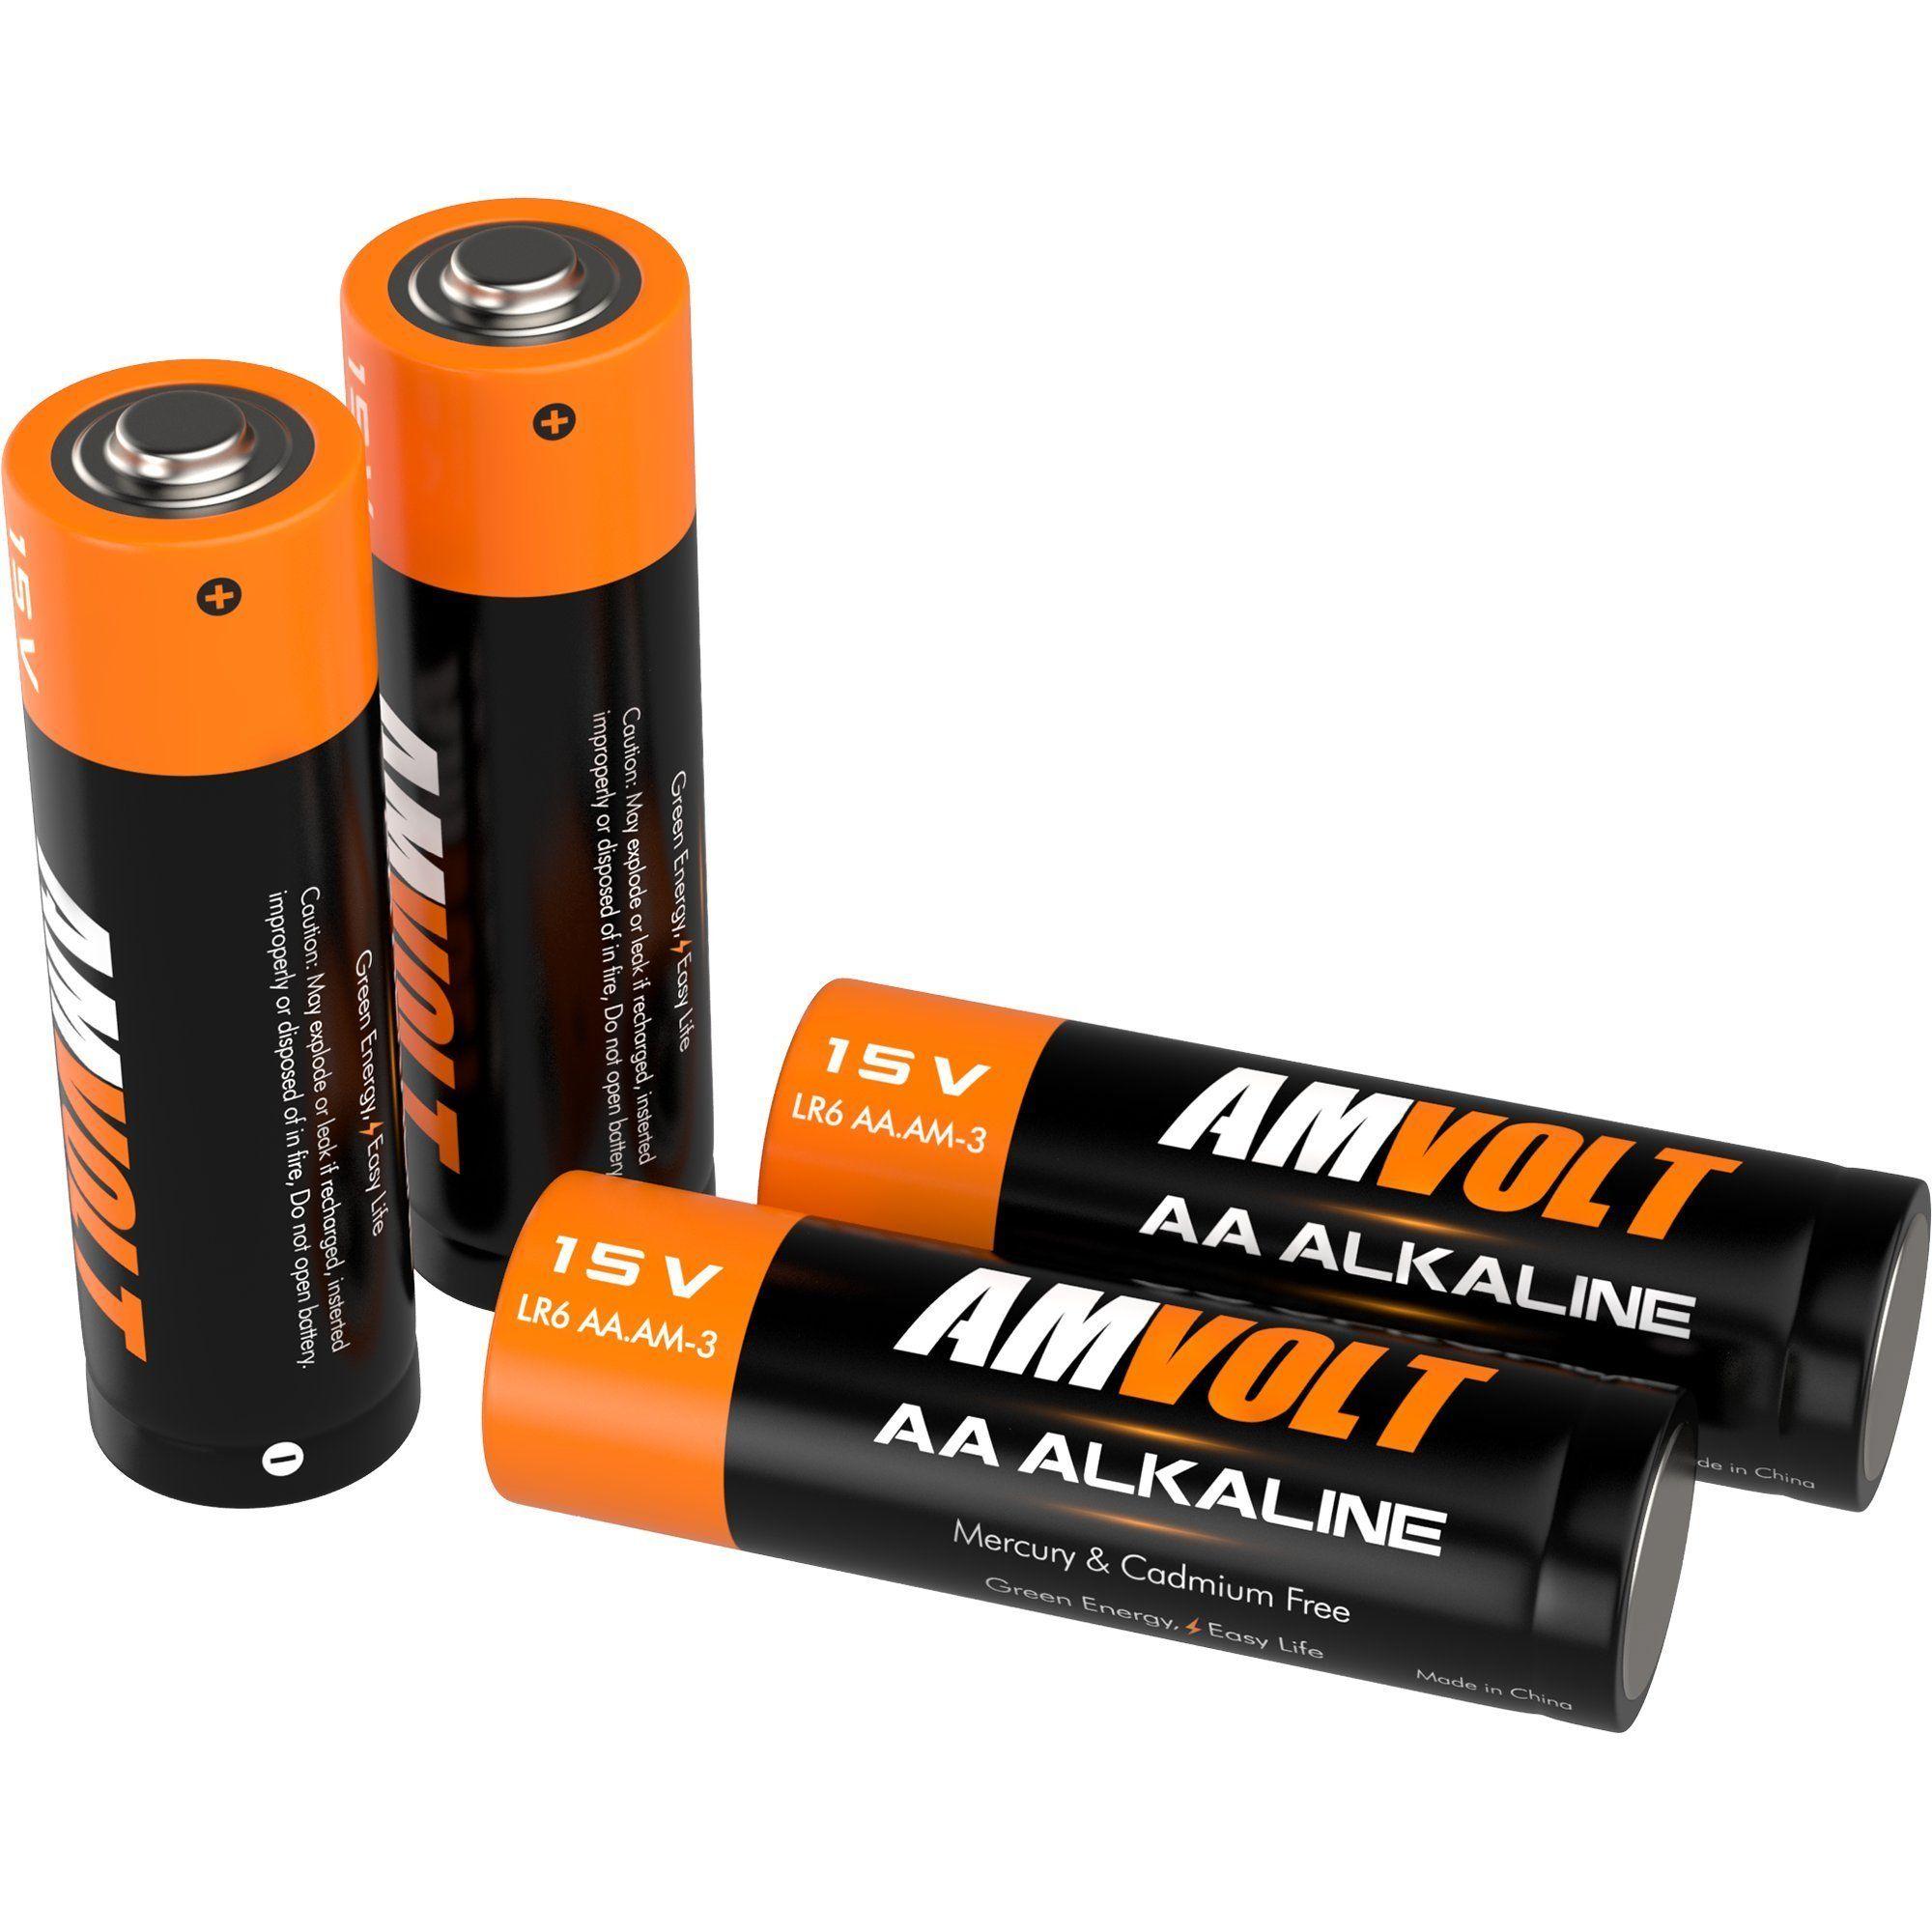 20 Pack Aa Batteries Premium Lr6 Alkaline Battery 1 5 Volt Non Rechargeable Batteries For Watches Cloc Rechargeable Batteries Game Controller Alkaline Battery